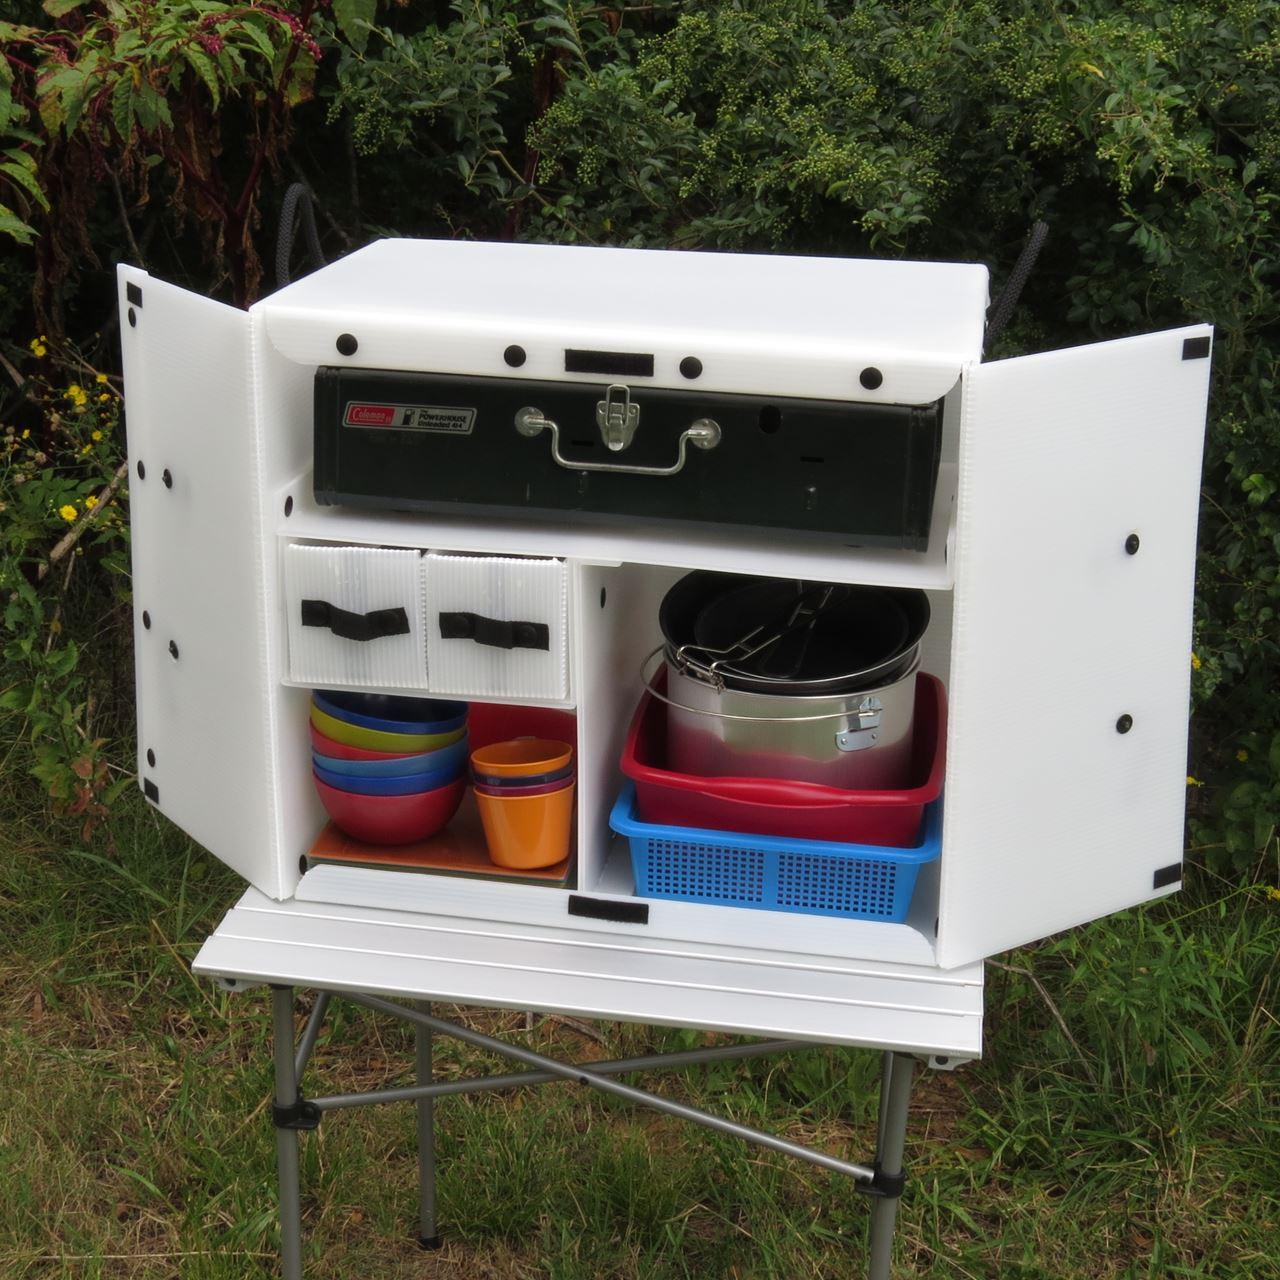 Enjoy cooking in camping kitchen